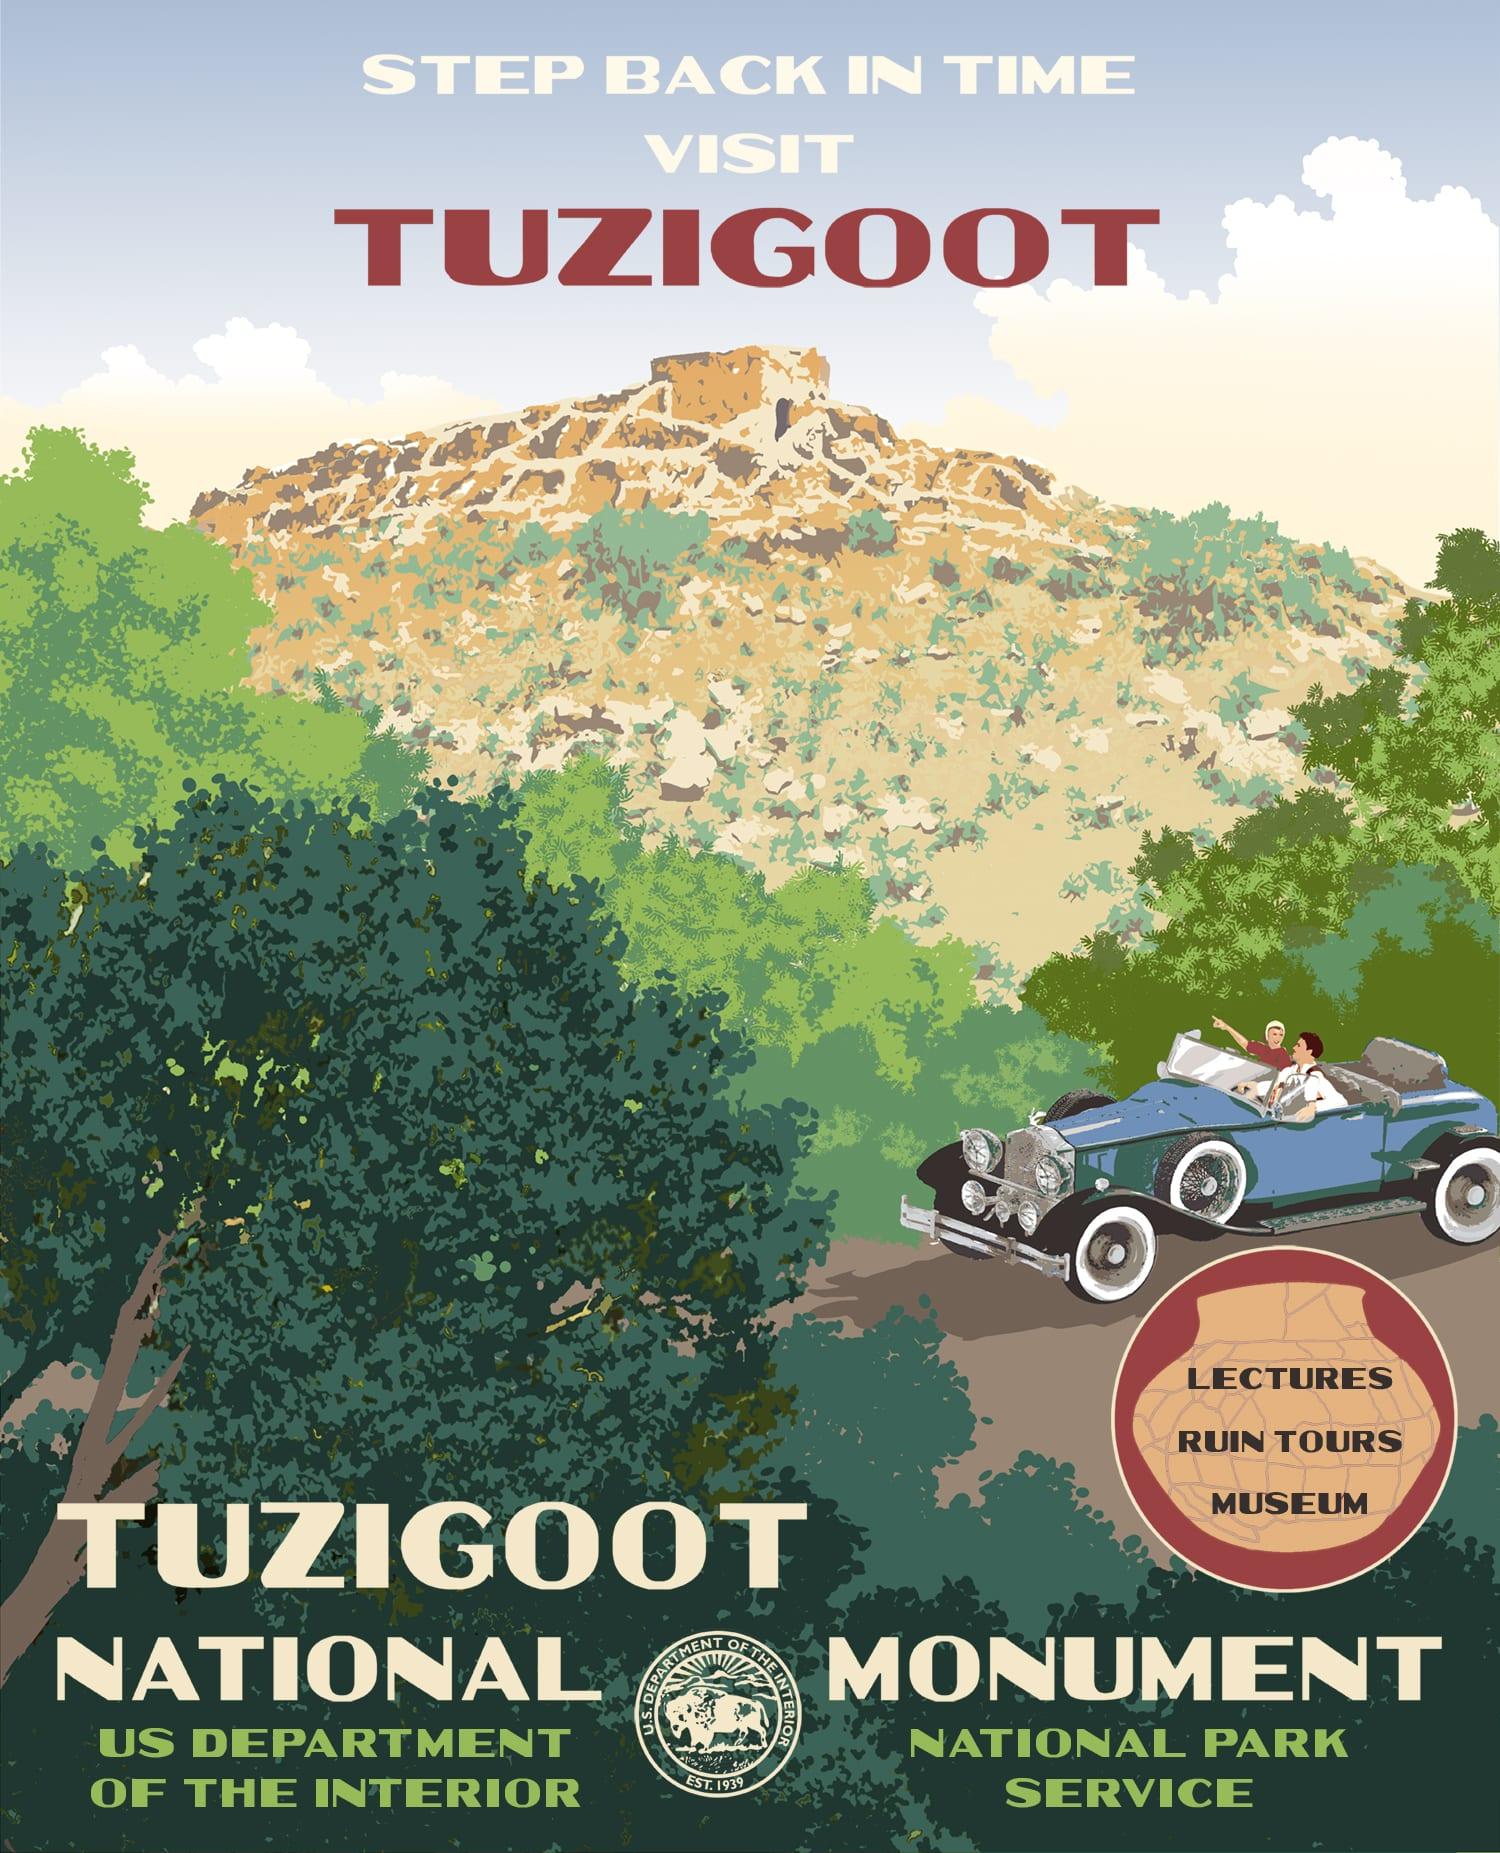 Visit Tuzigoot